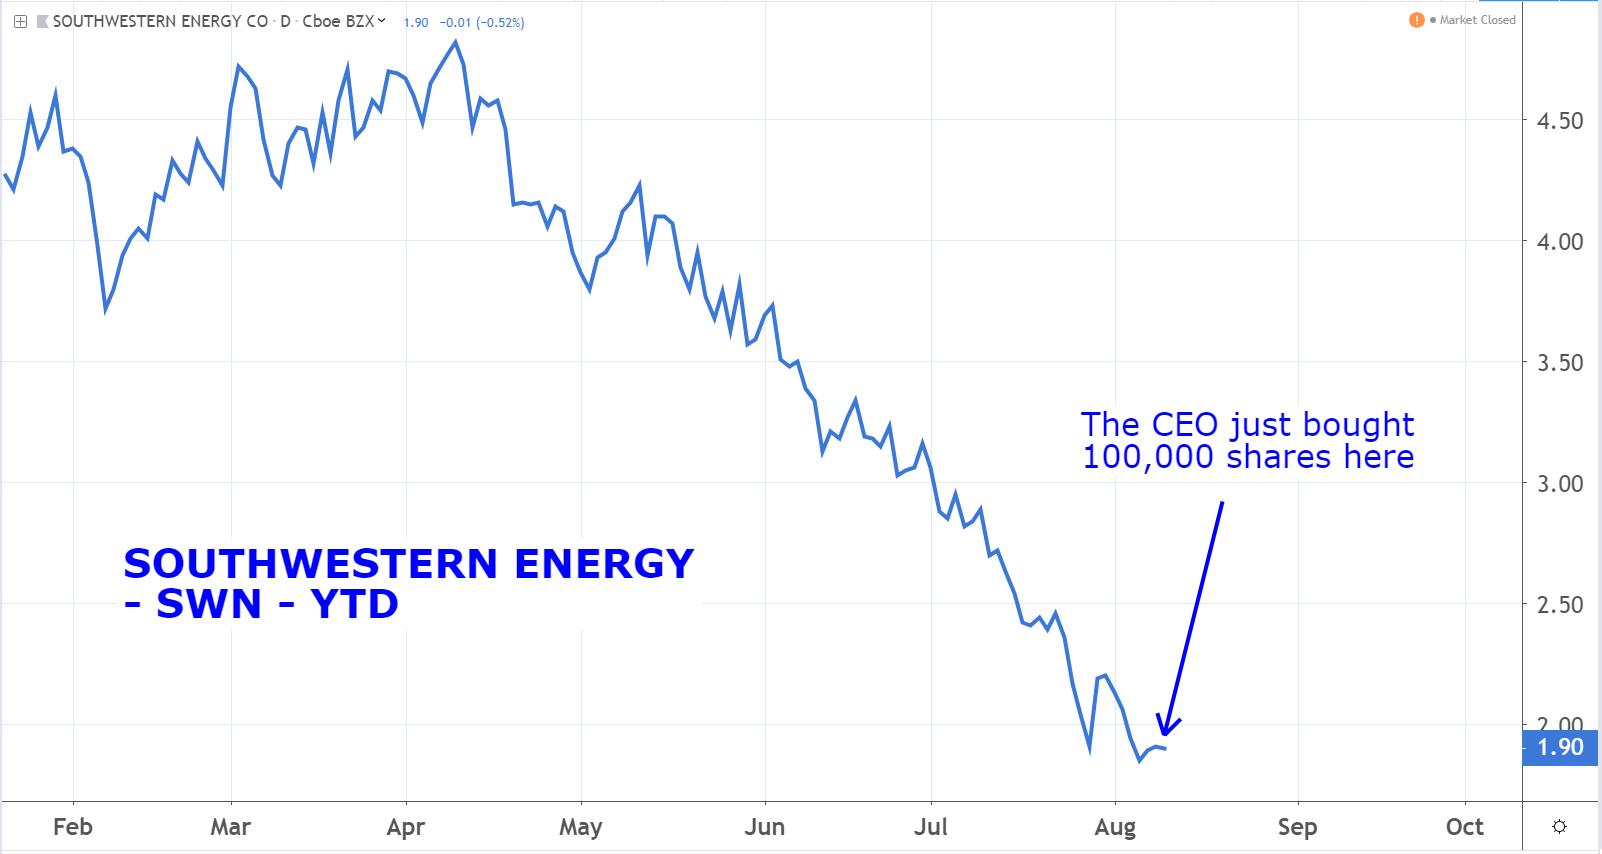 Stocks to Buy: Southwestern Energy (SWN)